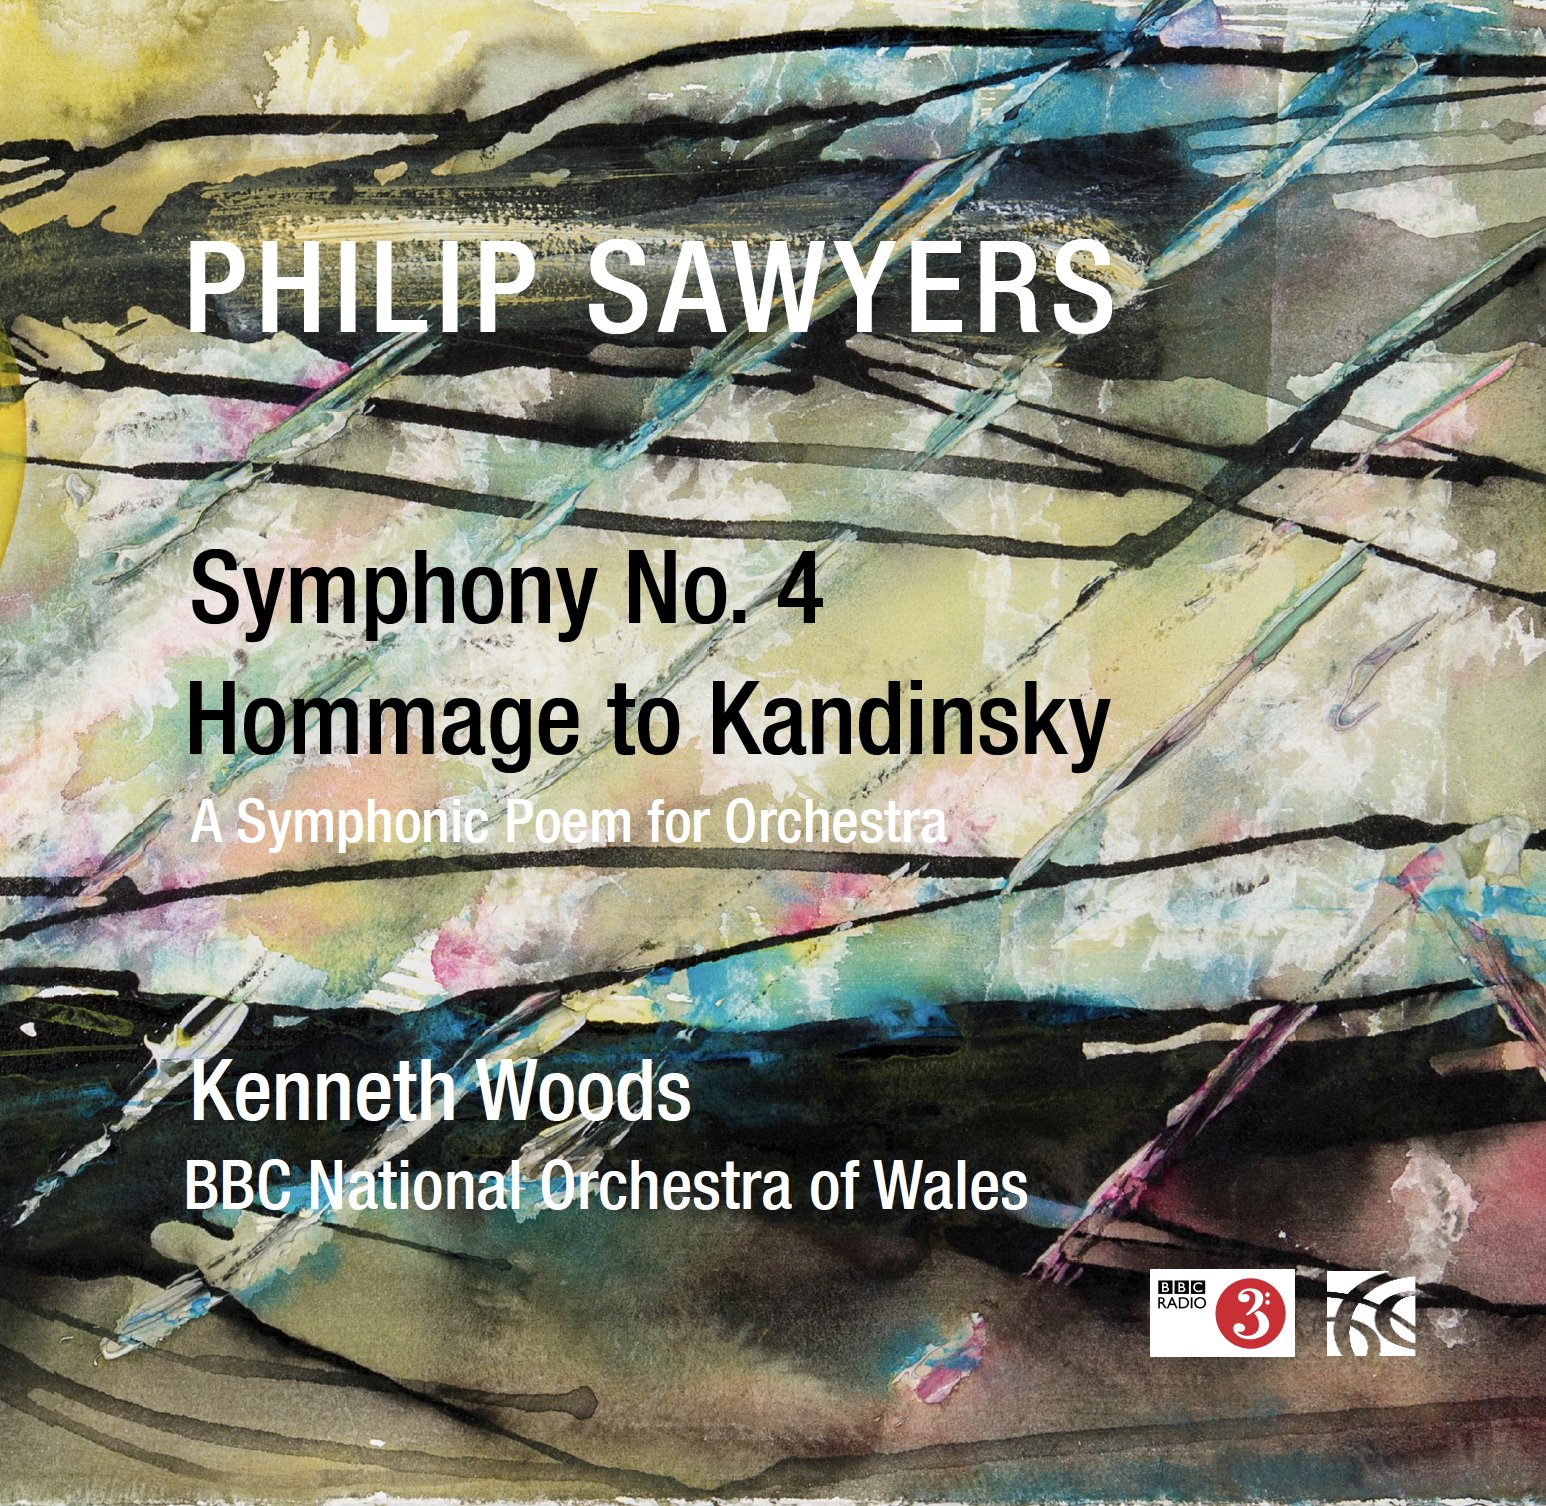 Explore the Score – Philip Sawyers, Hommage to Kandinsky